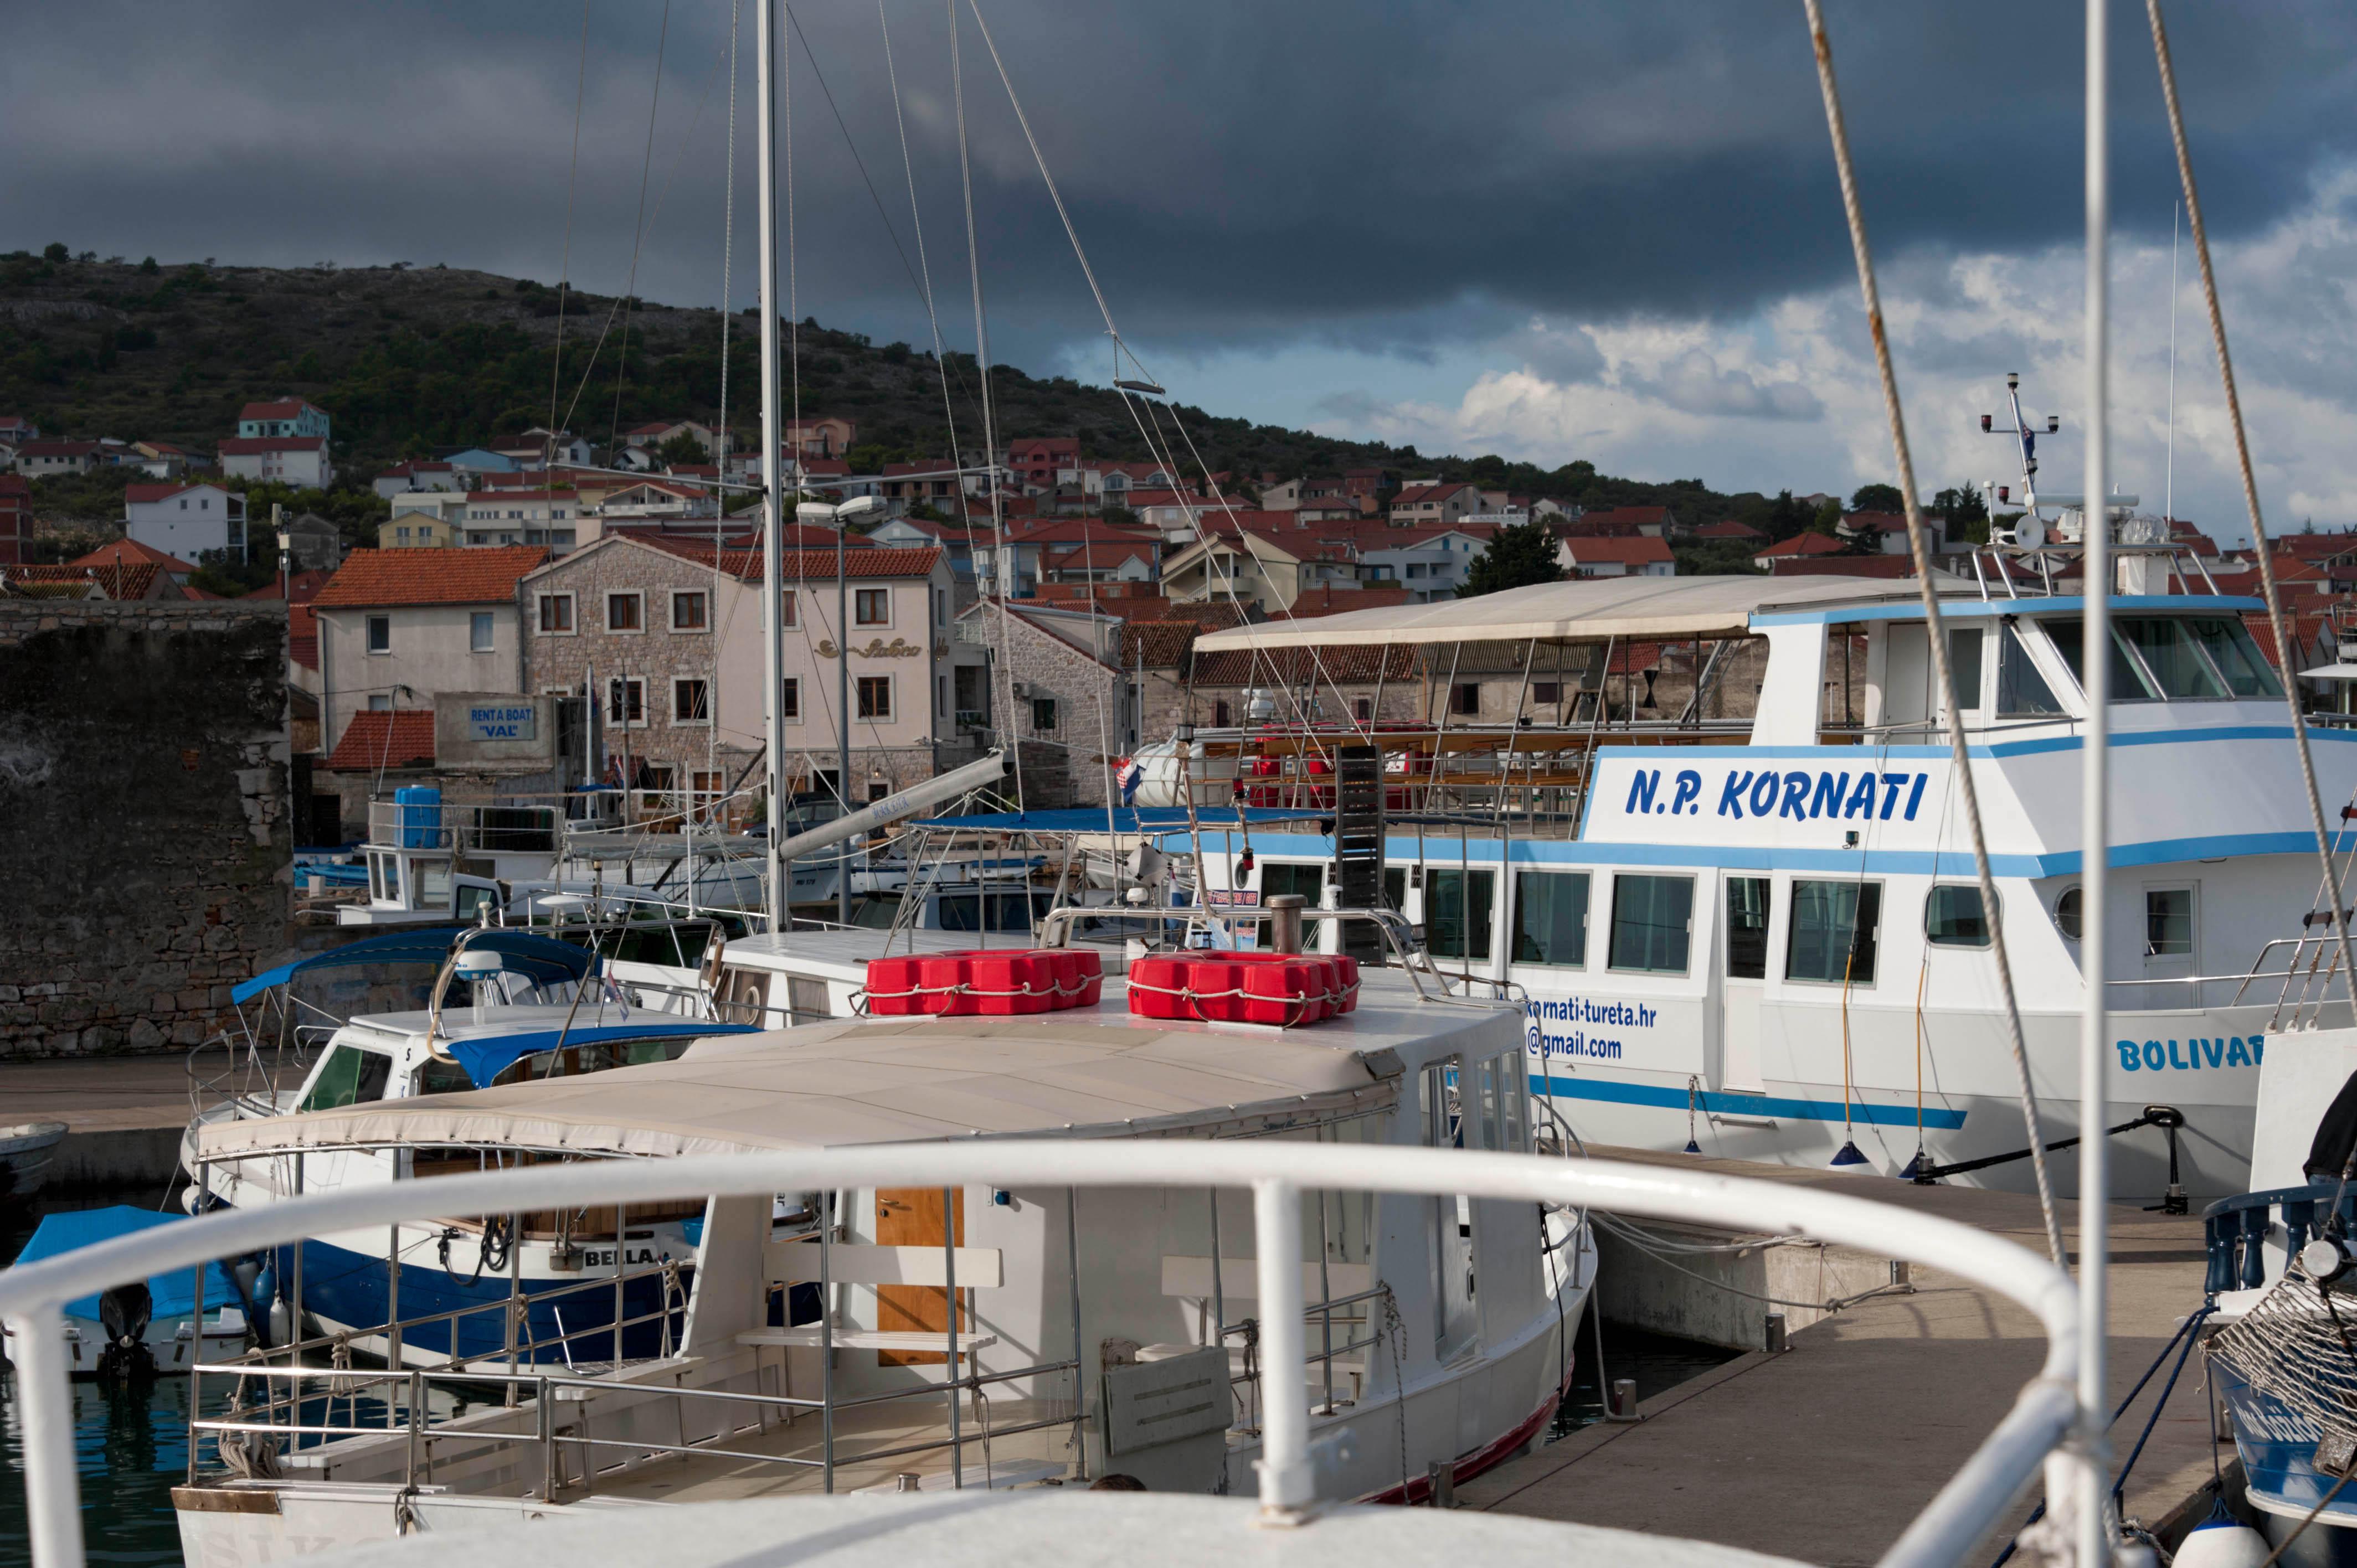 9576-Parc national iles Kornati (Dalmatie du Nord)